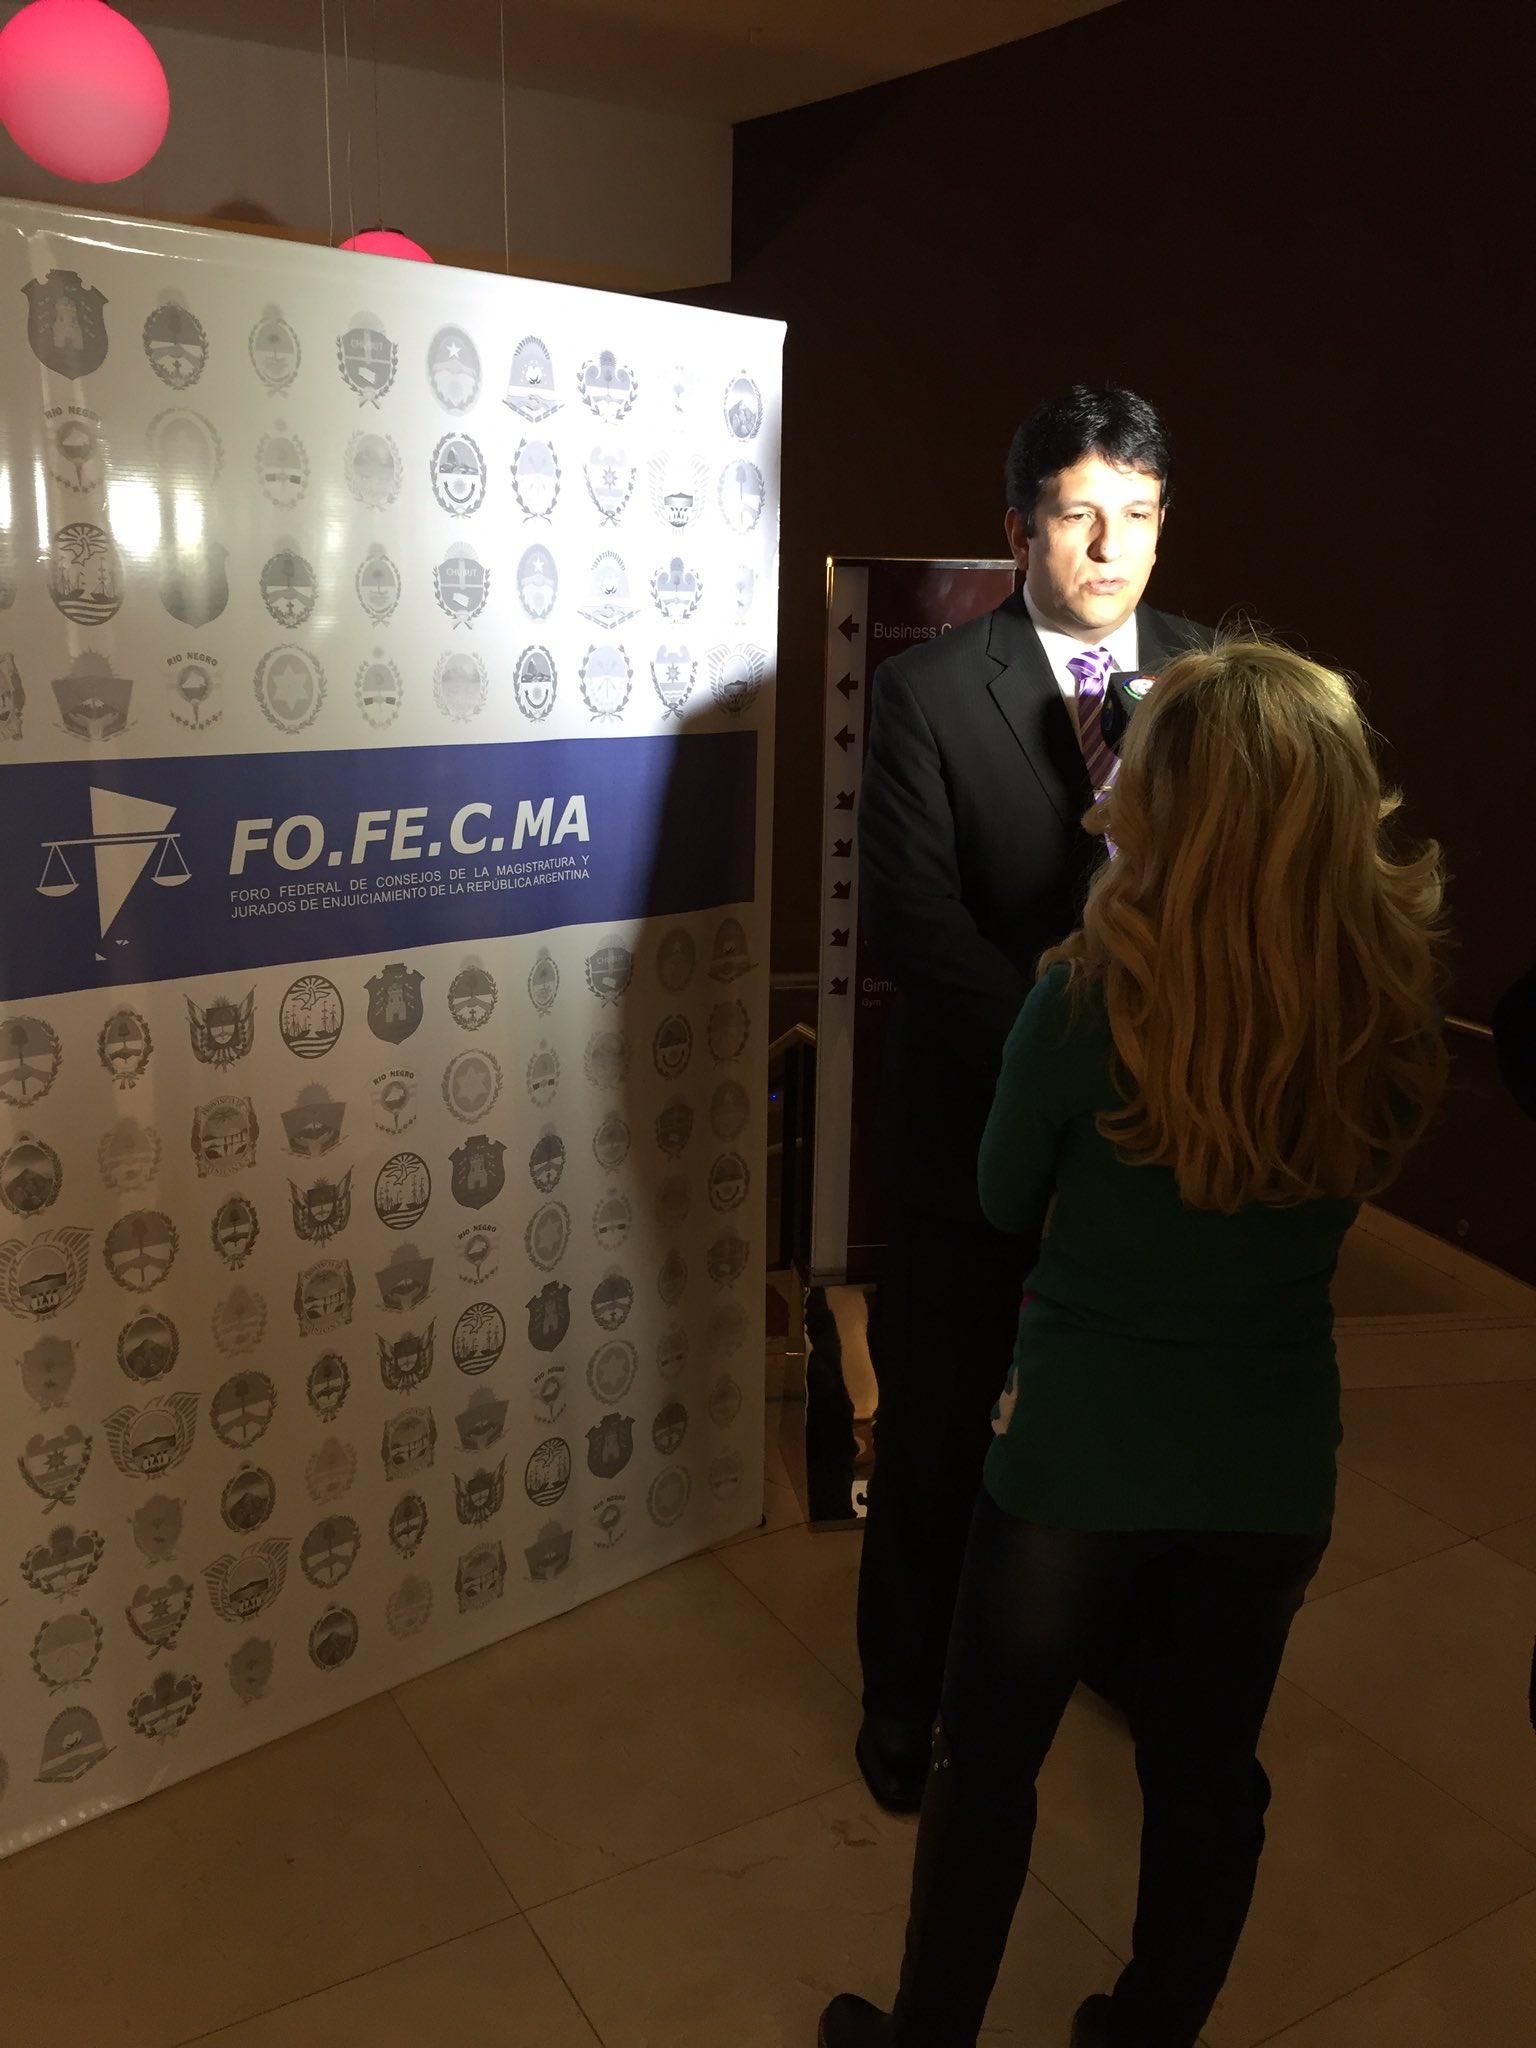 Arrancando las Jornadas @fofecma @CAM_TUCUMAN https://t.co/j9cSQxDZ3H